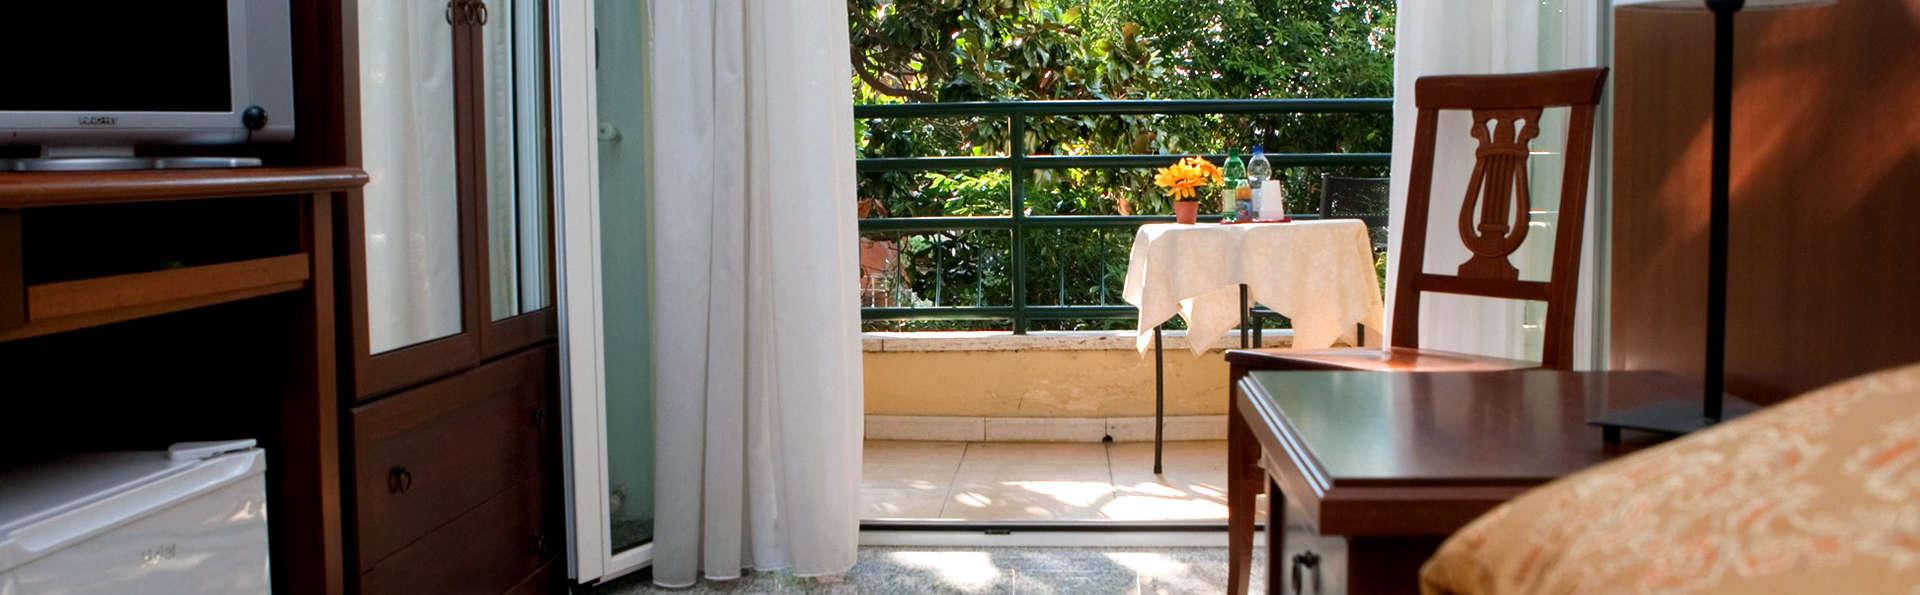 Hotel Antico Acquedotto - Edit_Room7.jpg